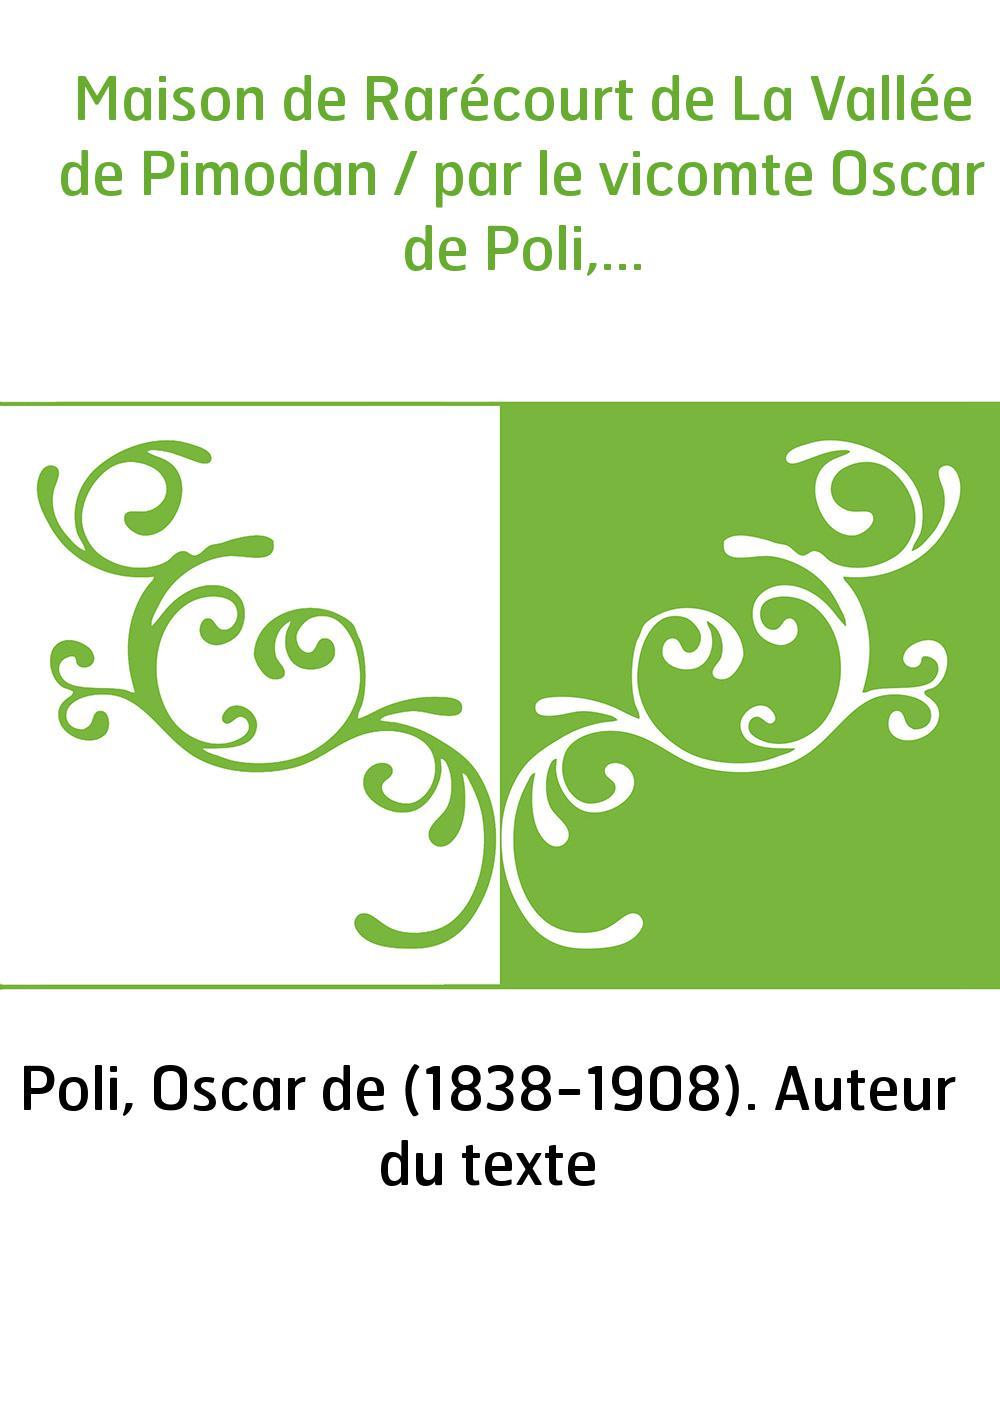 Maison de Rarécourt de La Vallée de Pimodan / par le vicomte Oscar de Poli,...